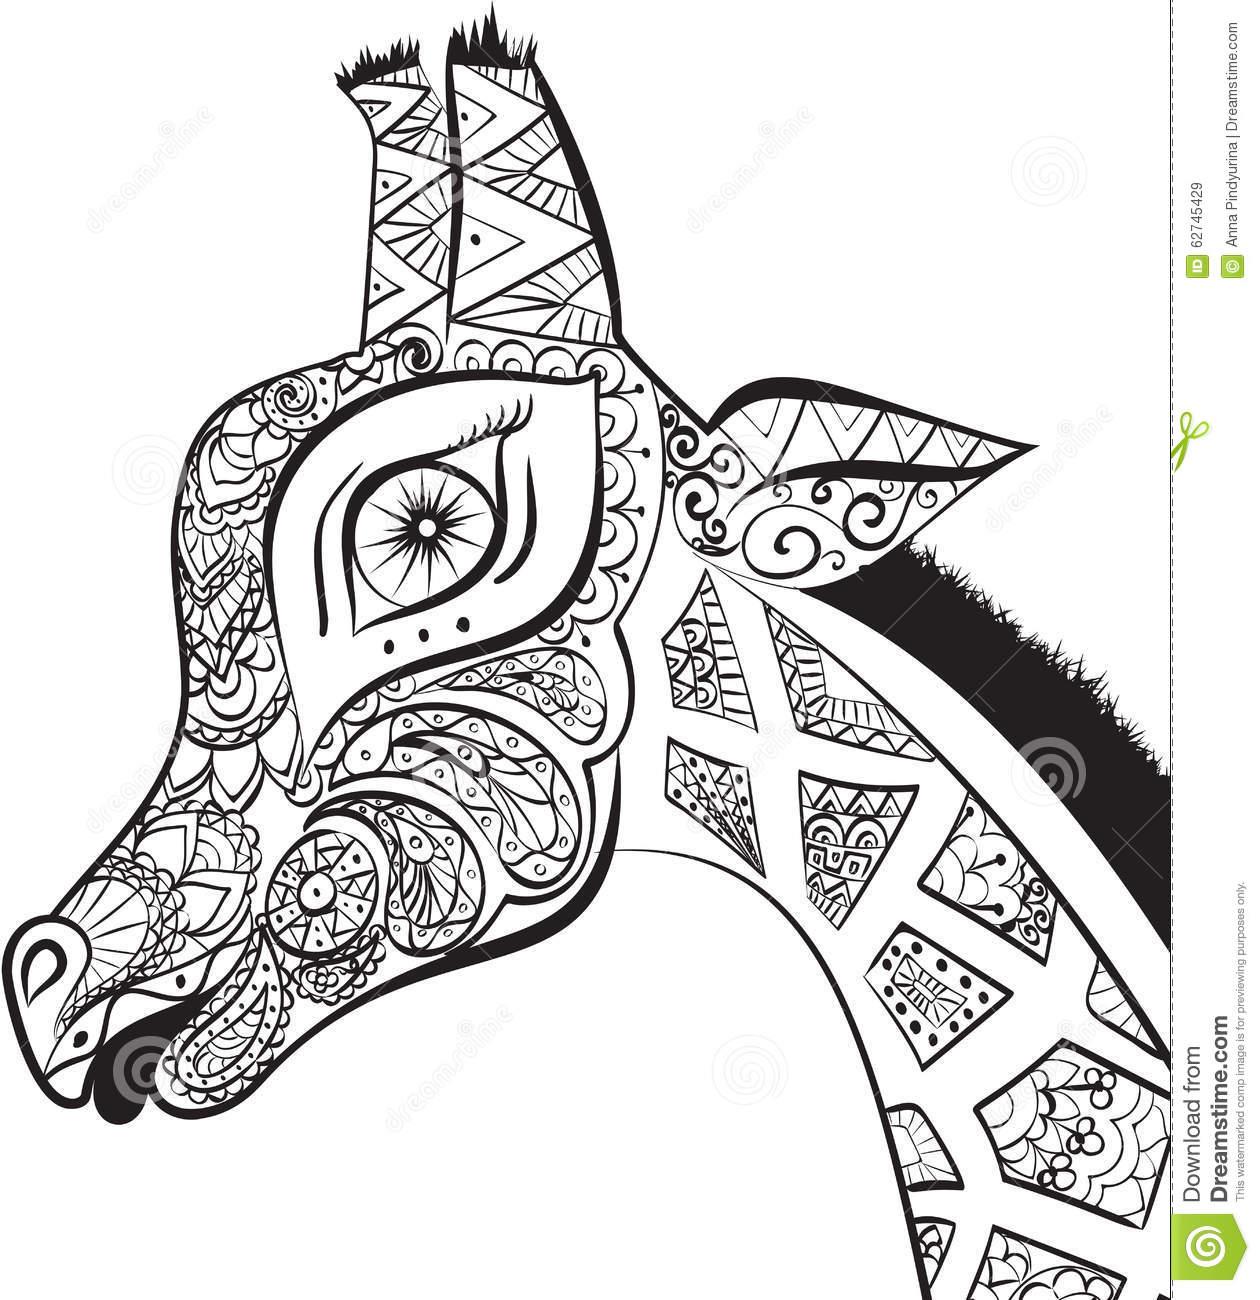 Giraffe kopf clipart clipart transparent stock Beautiful Adult Giraffe. Hand Drawn Illustration Of Ornamental ... clipart transparent stock